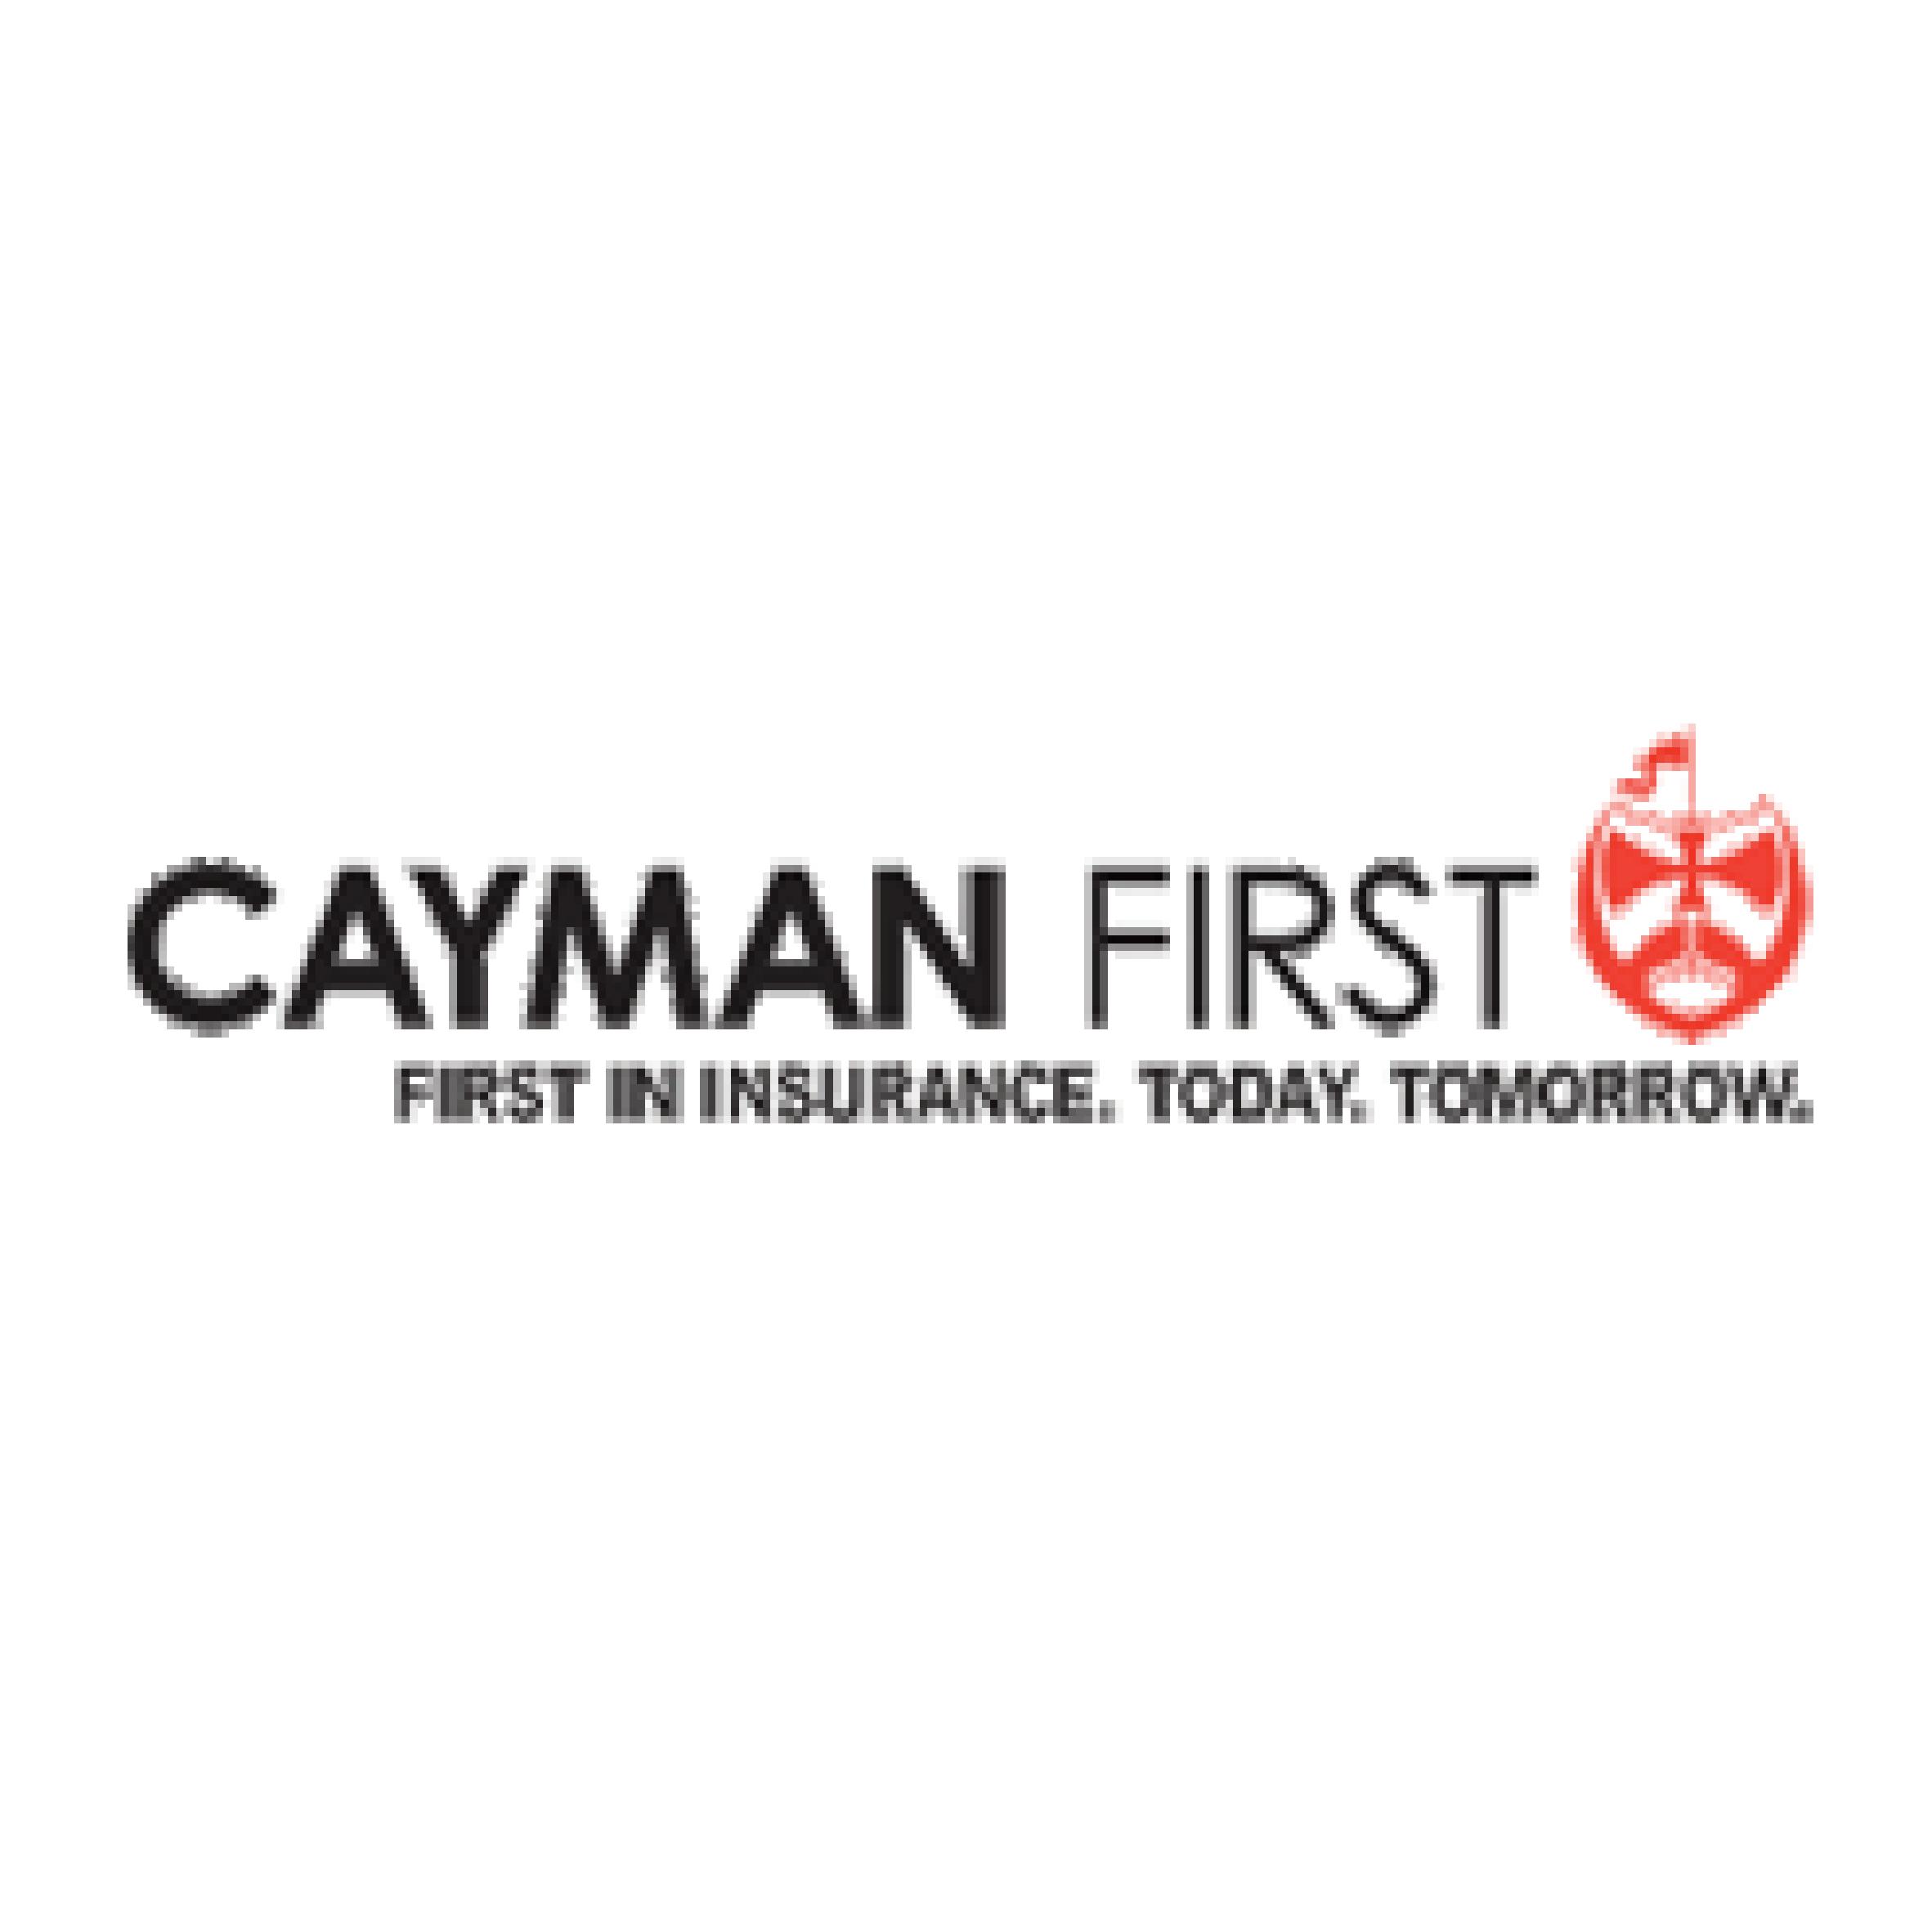 Cayman First Insurance Company Ltd. logo.